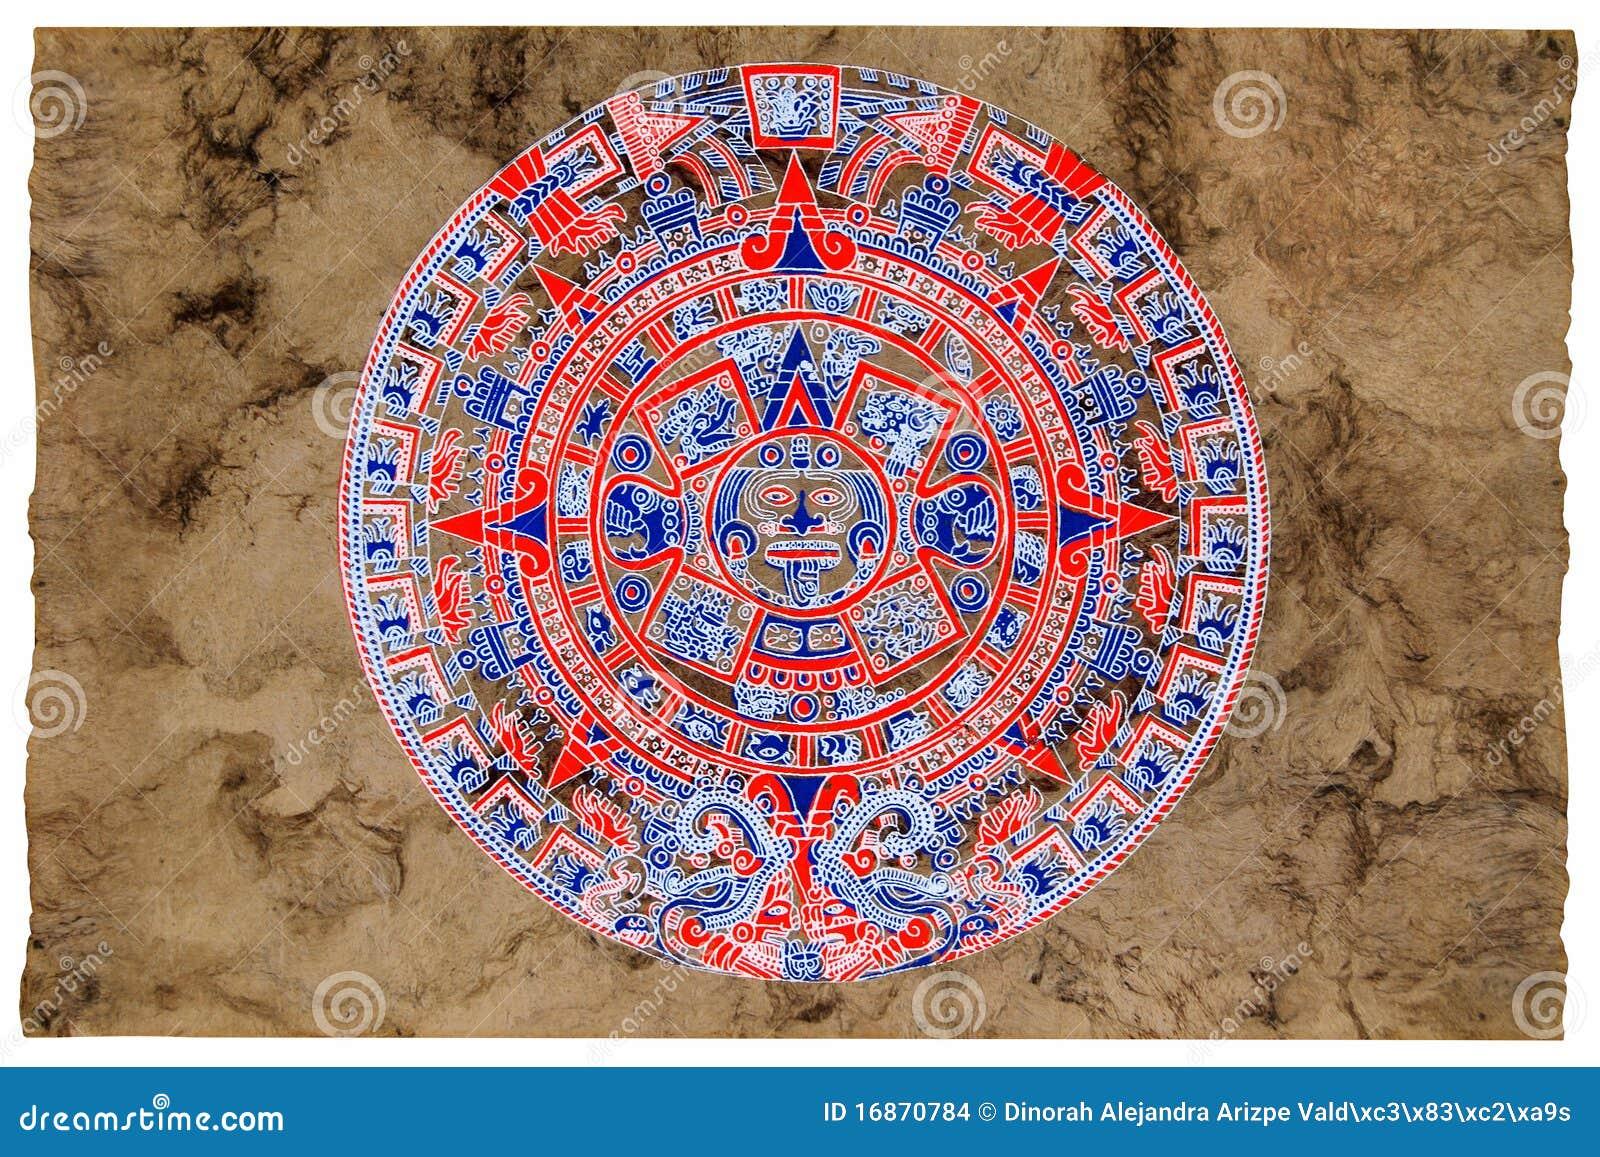 research paper on mayan calendar